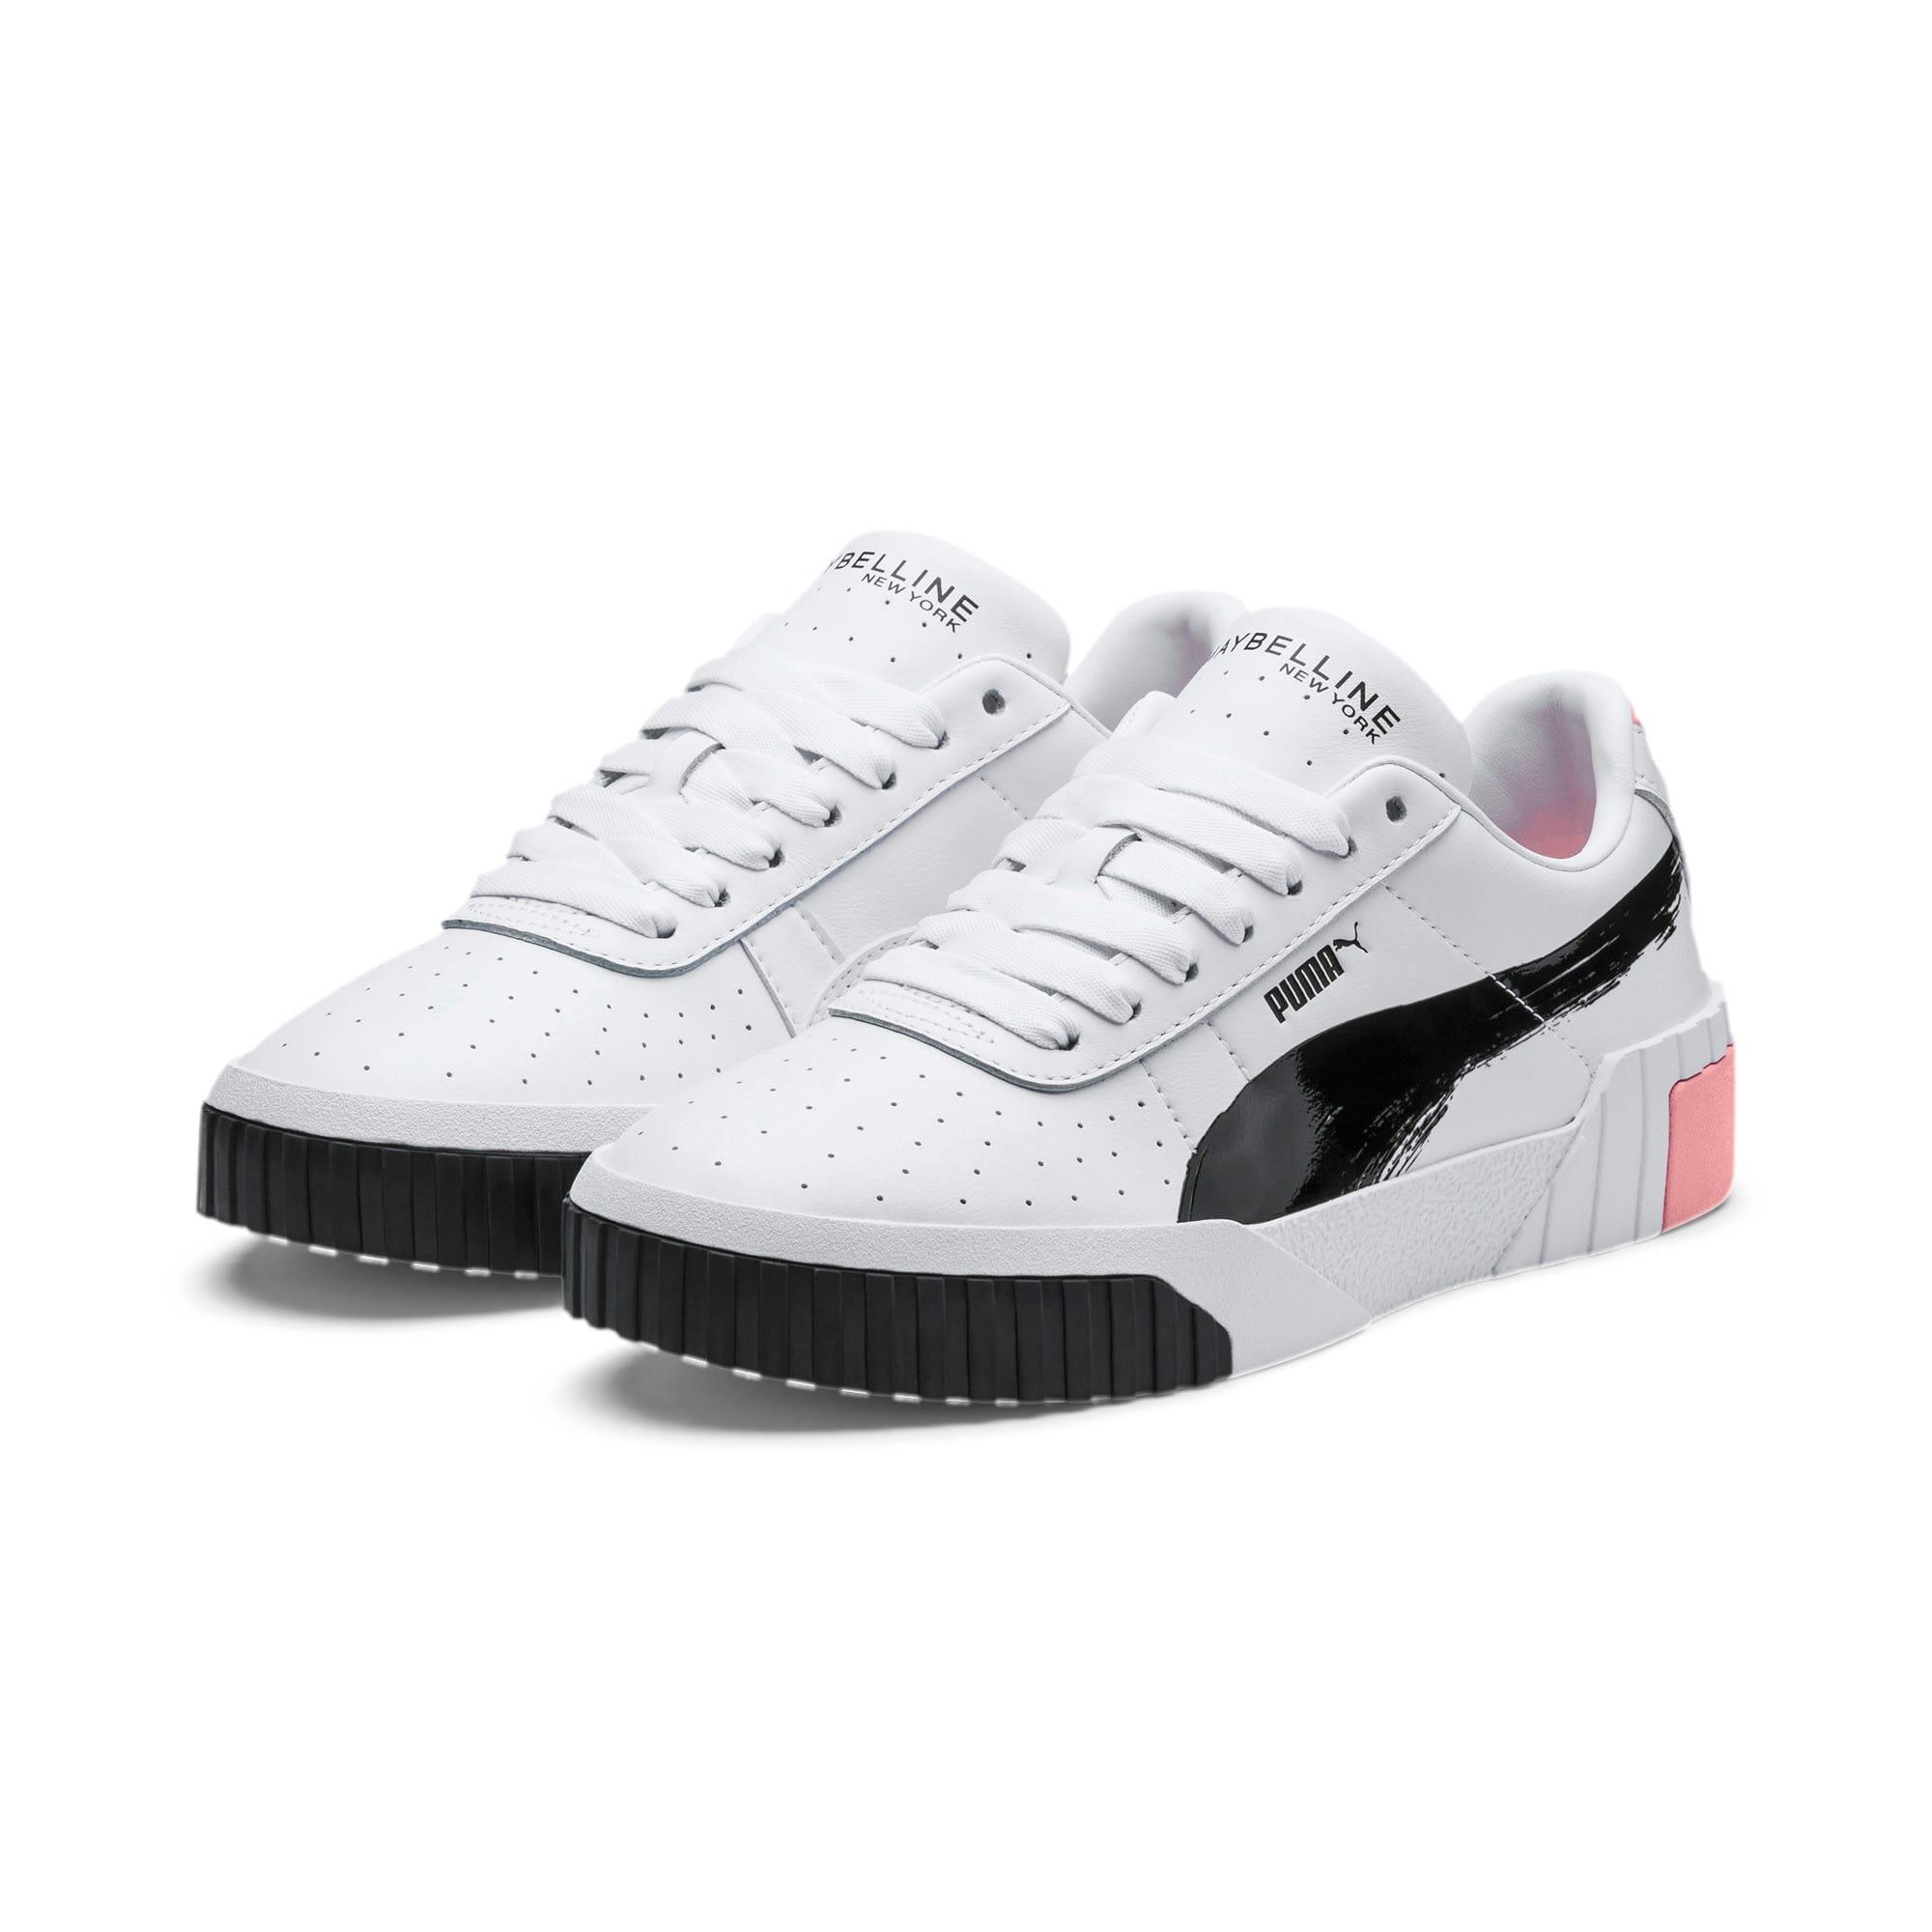 Thumbnail 2 of PUMA x MAYBELLINE Cali Women's Sneakers, Puma White-Puma Black, medium